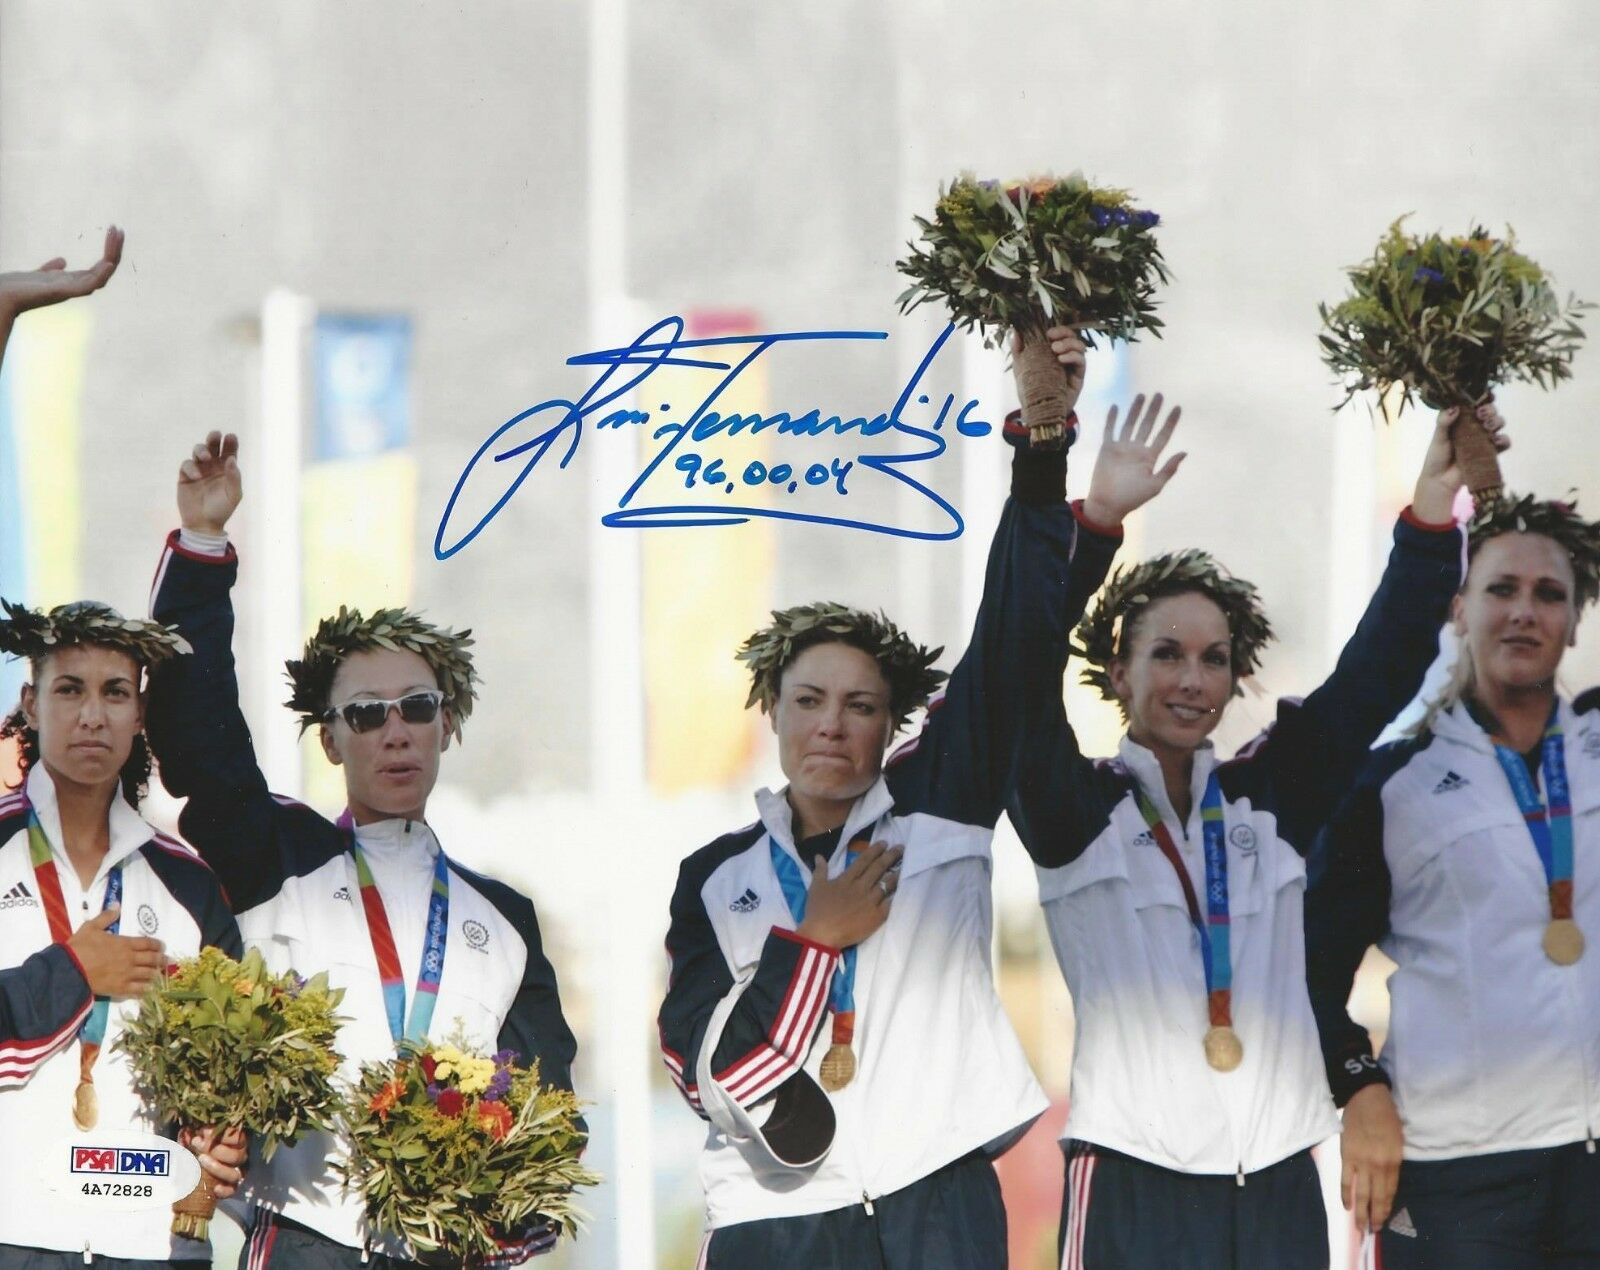 Lisa Fernandez Olympic Gold Medal Winner Signed 8x10 Photo PSA/DNA Cert #4A72828